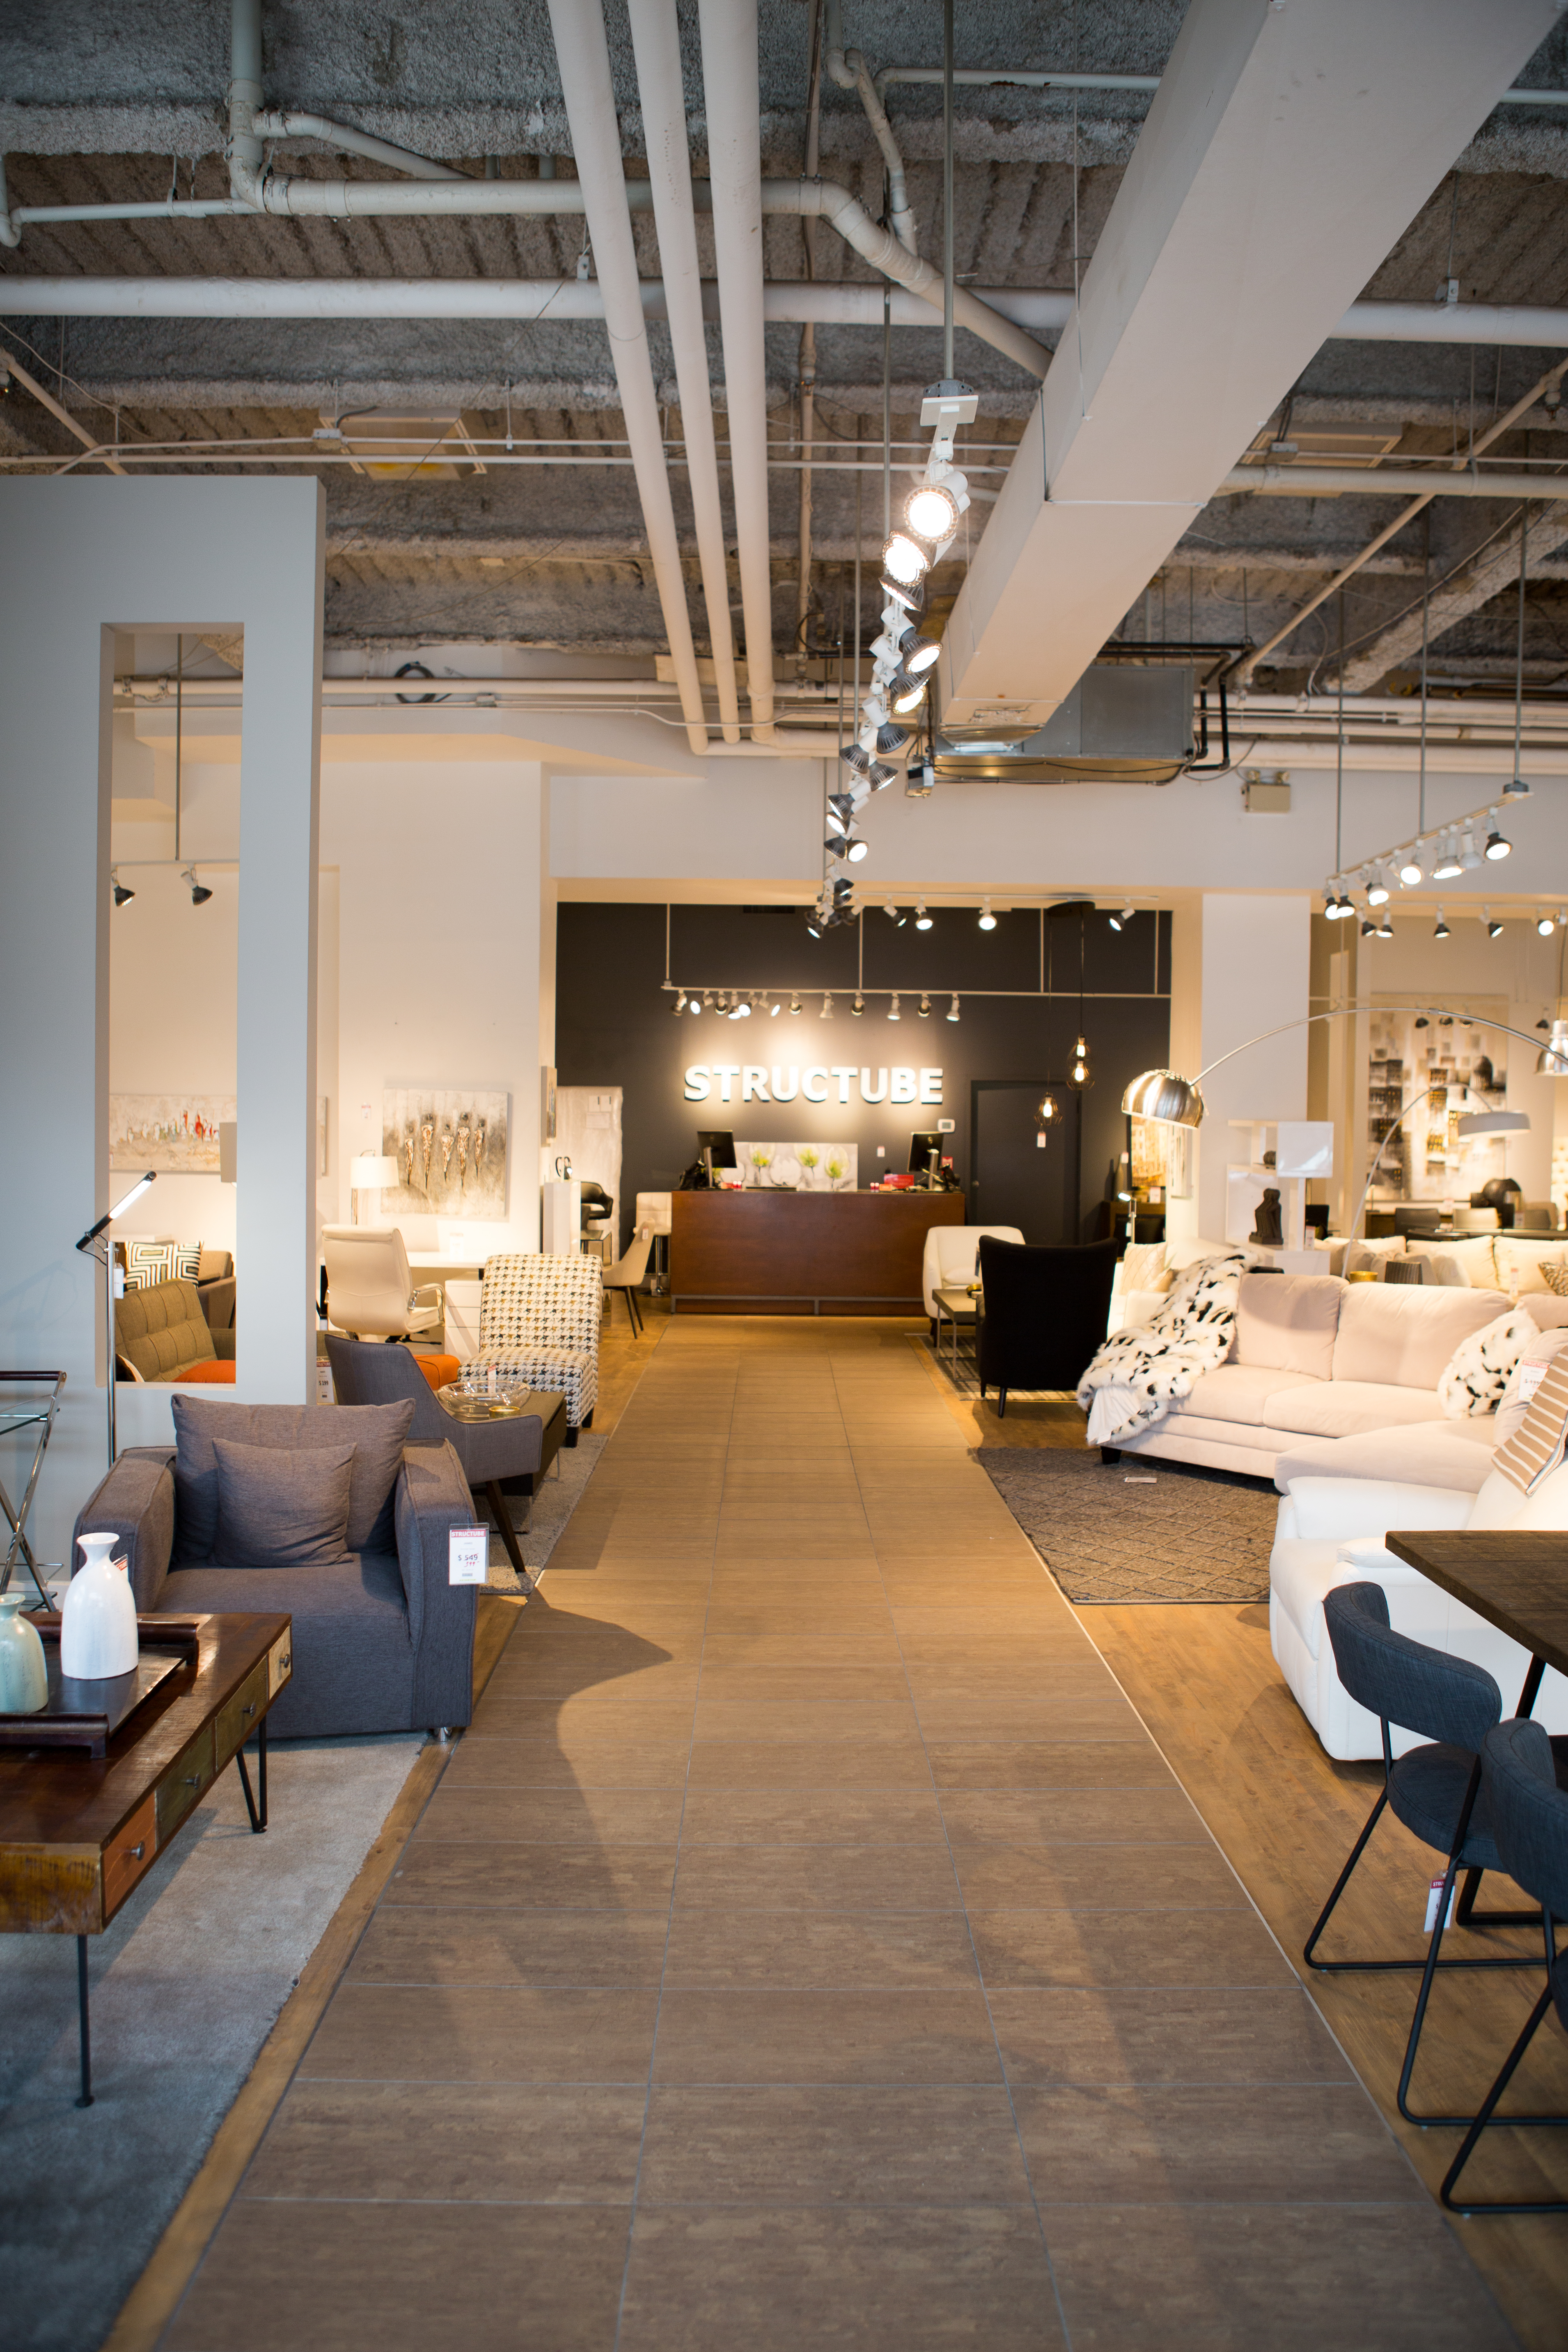 Structube Store In Yorkville Toronto Ontario Canada